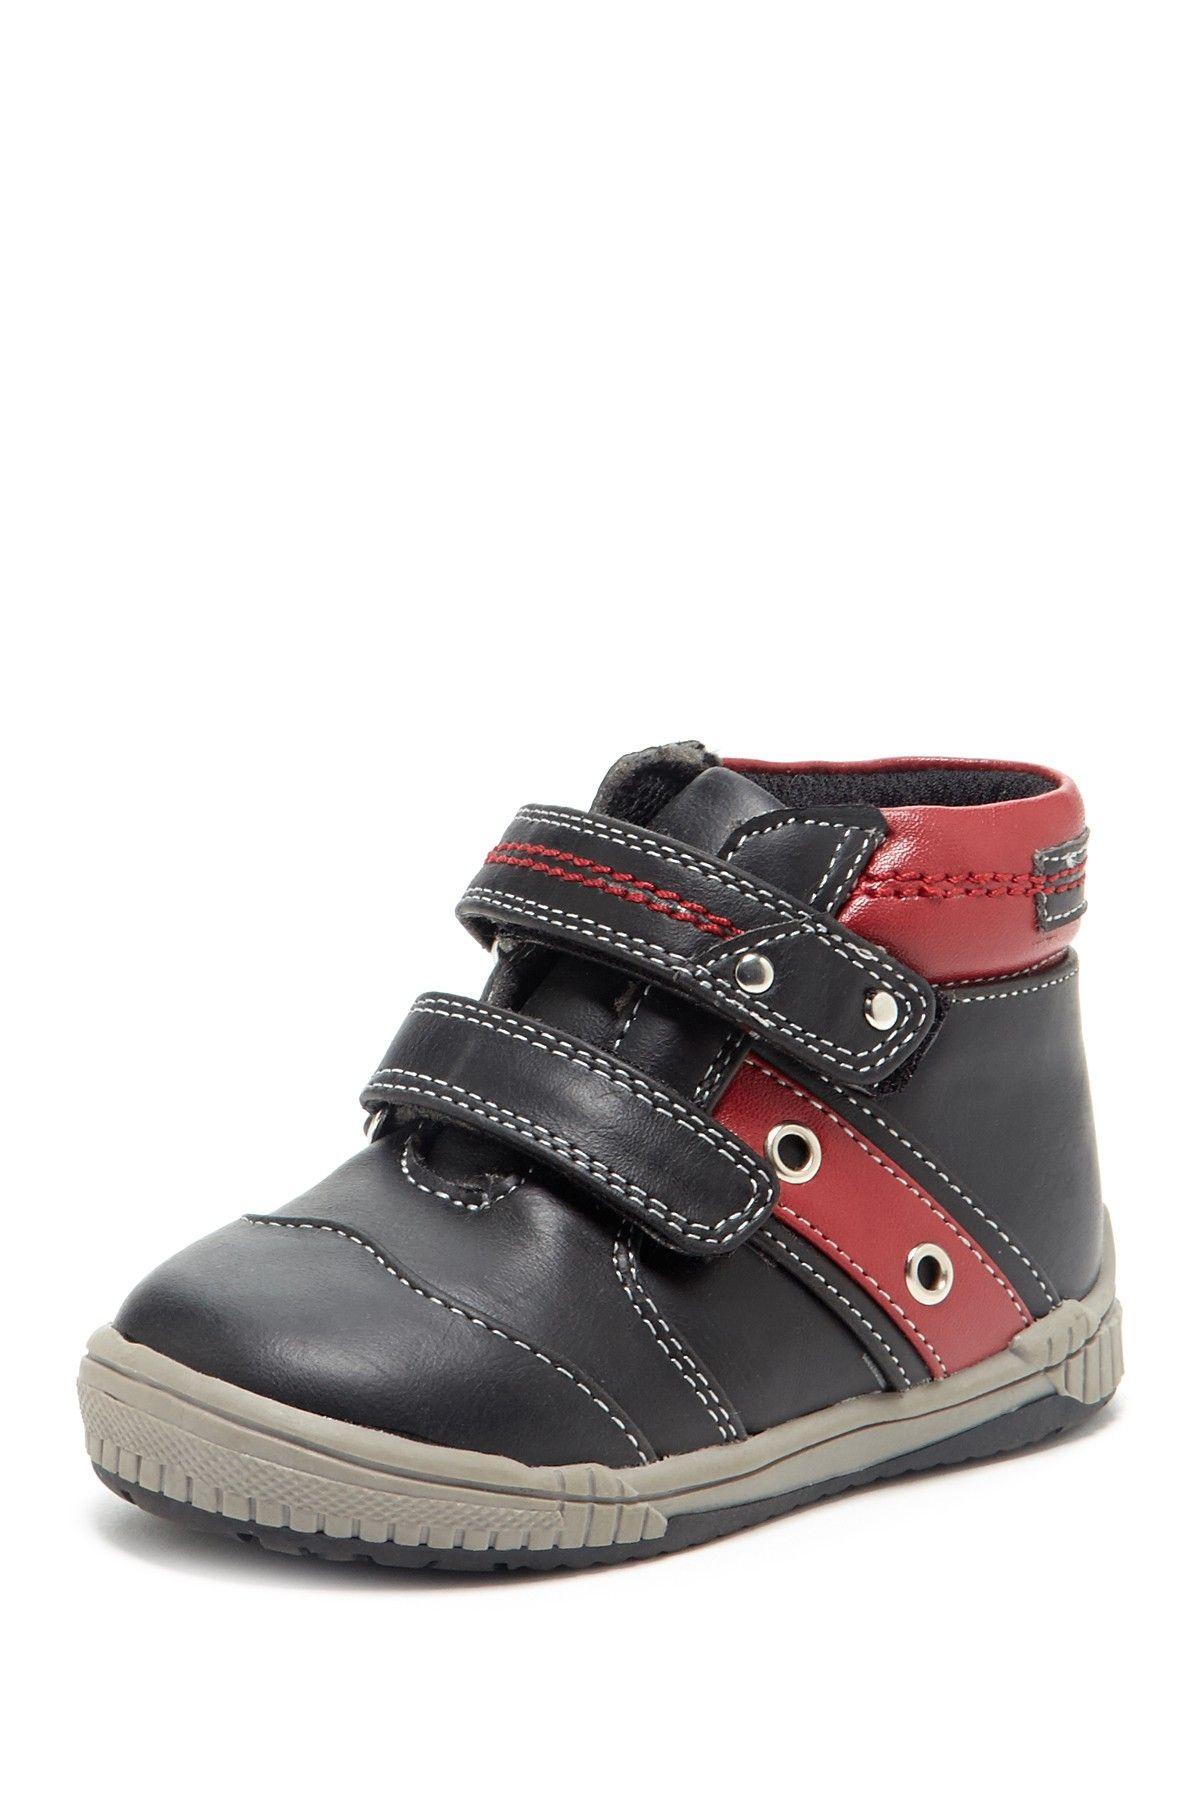 Joseph Allen Double Velcro Strap High Top Sneaker  SneakerKids